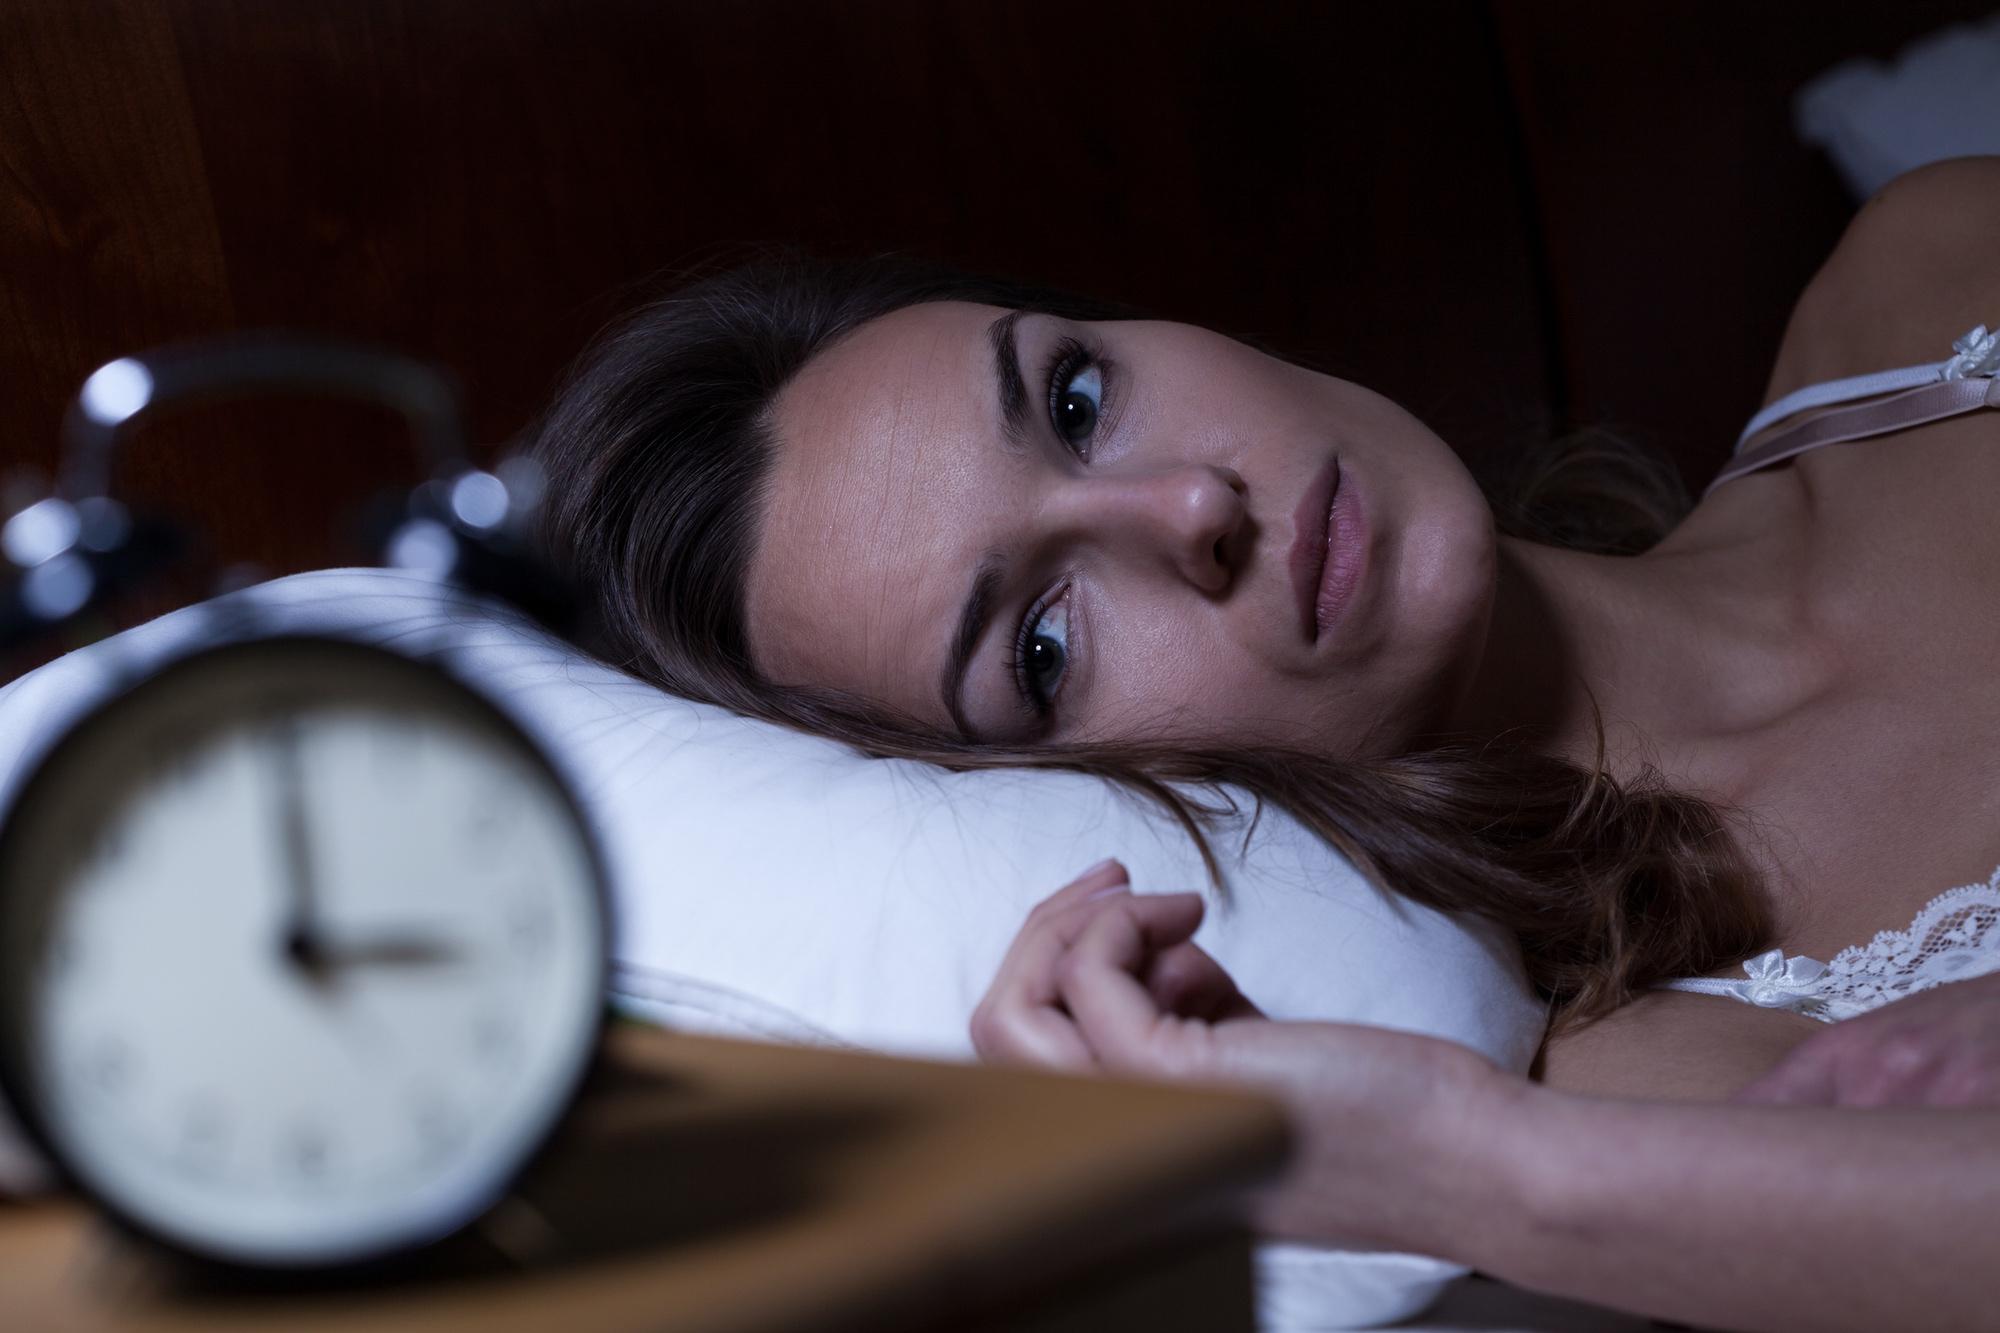 can carisoprodol cause insomnia?